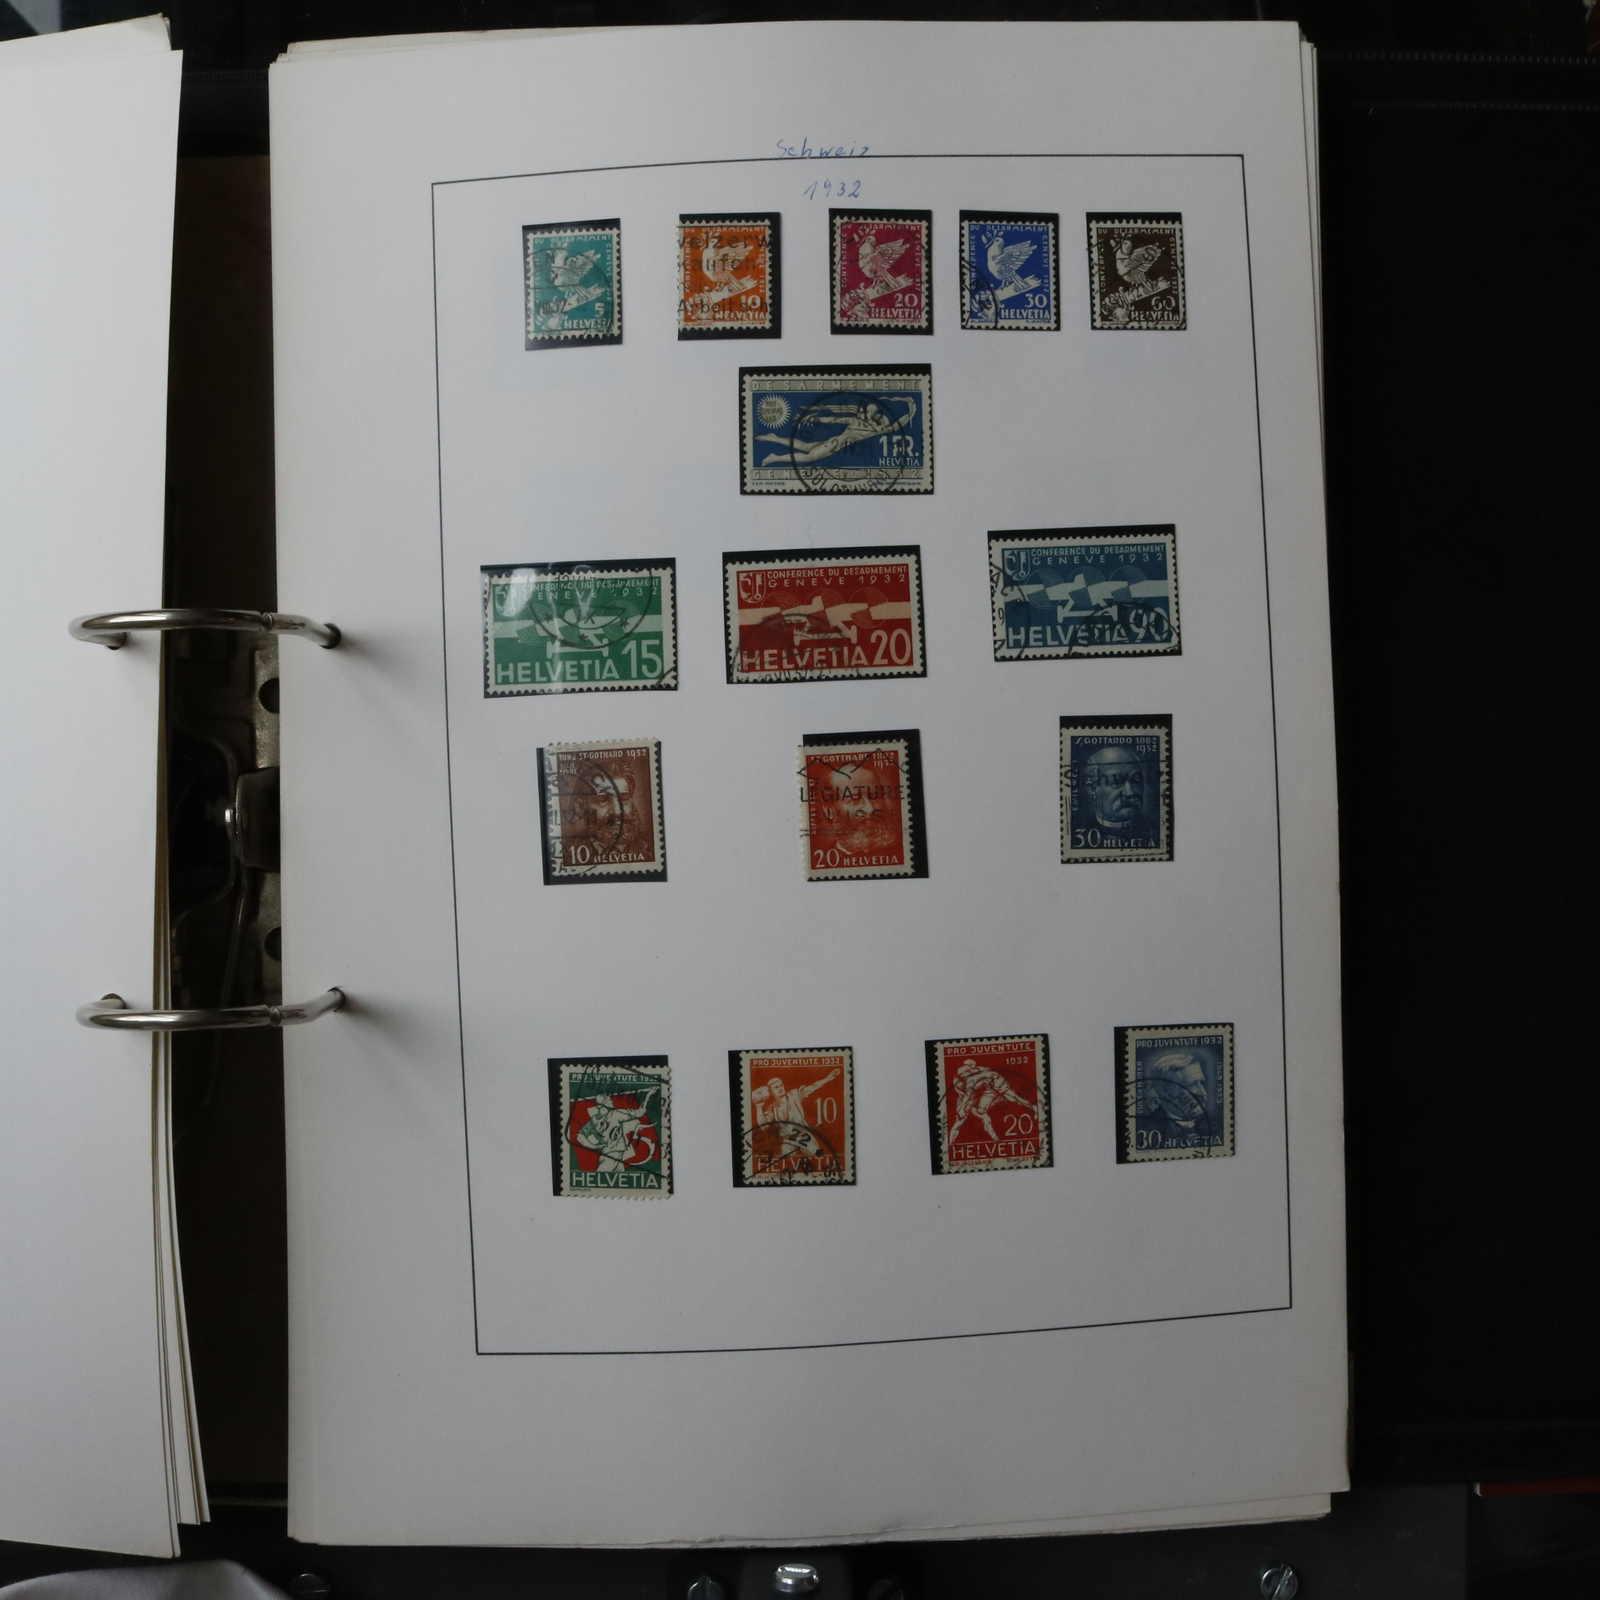 Lot 2584 - COLLECTIONS & ACCUMULATIONS Switzerland -  Auktionshaus Schlegel 26 Public Auction